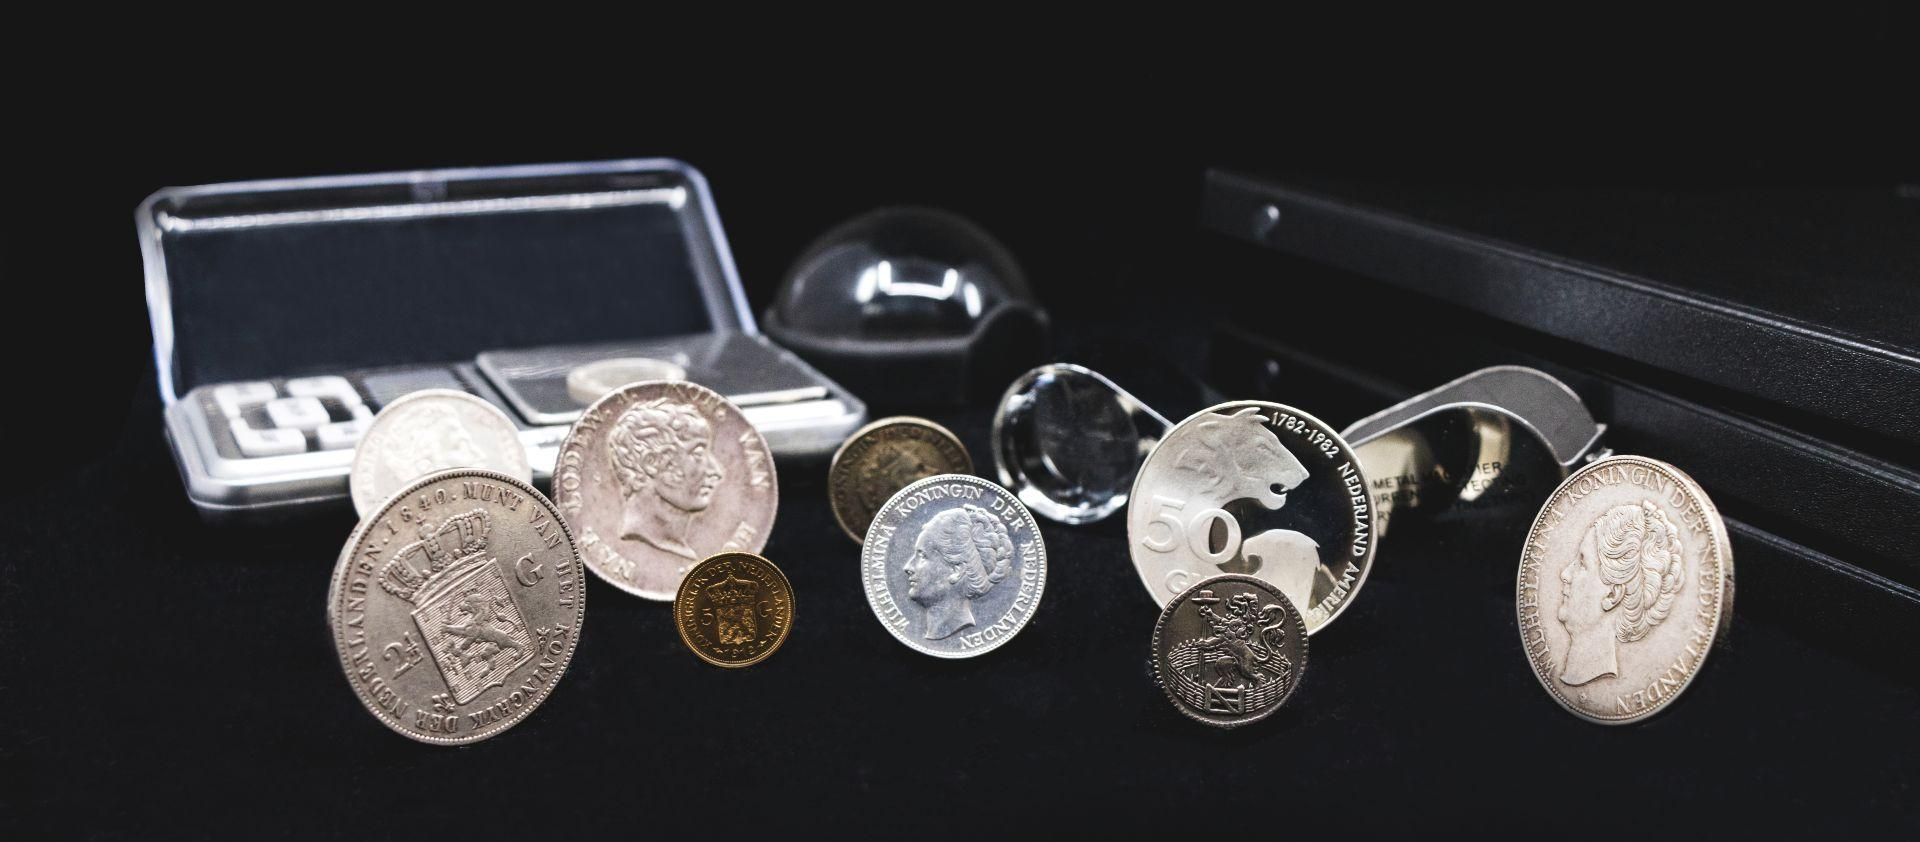 sfeerfoto_David-coin